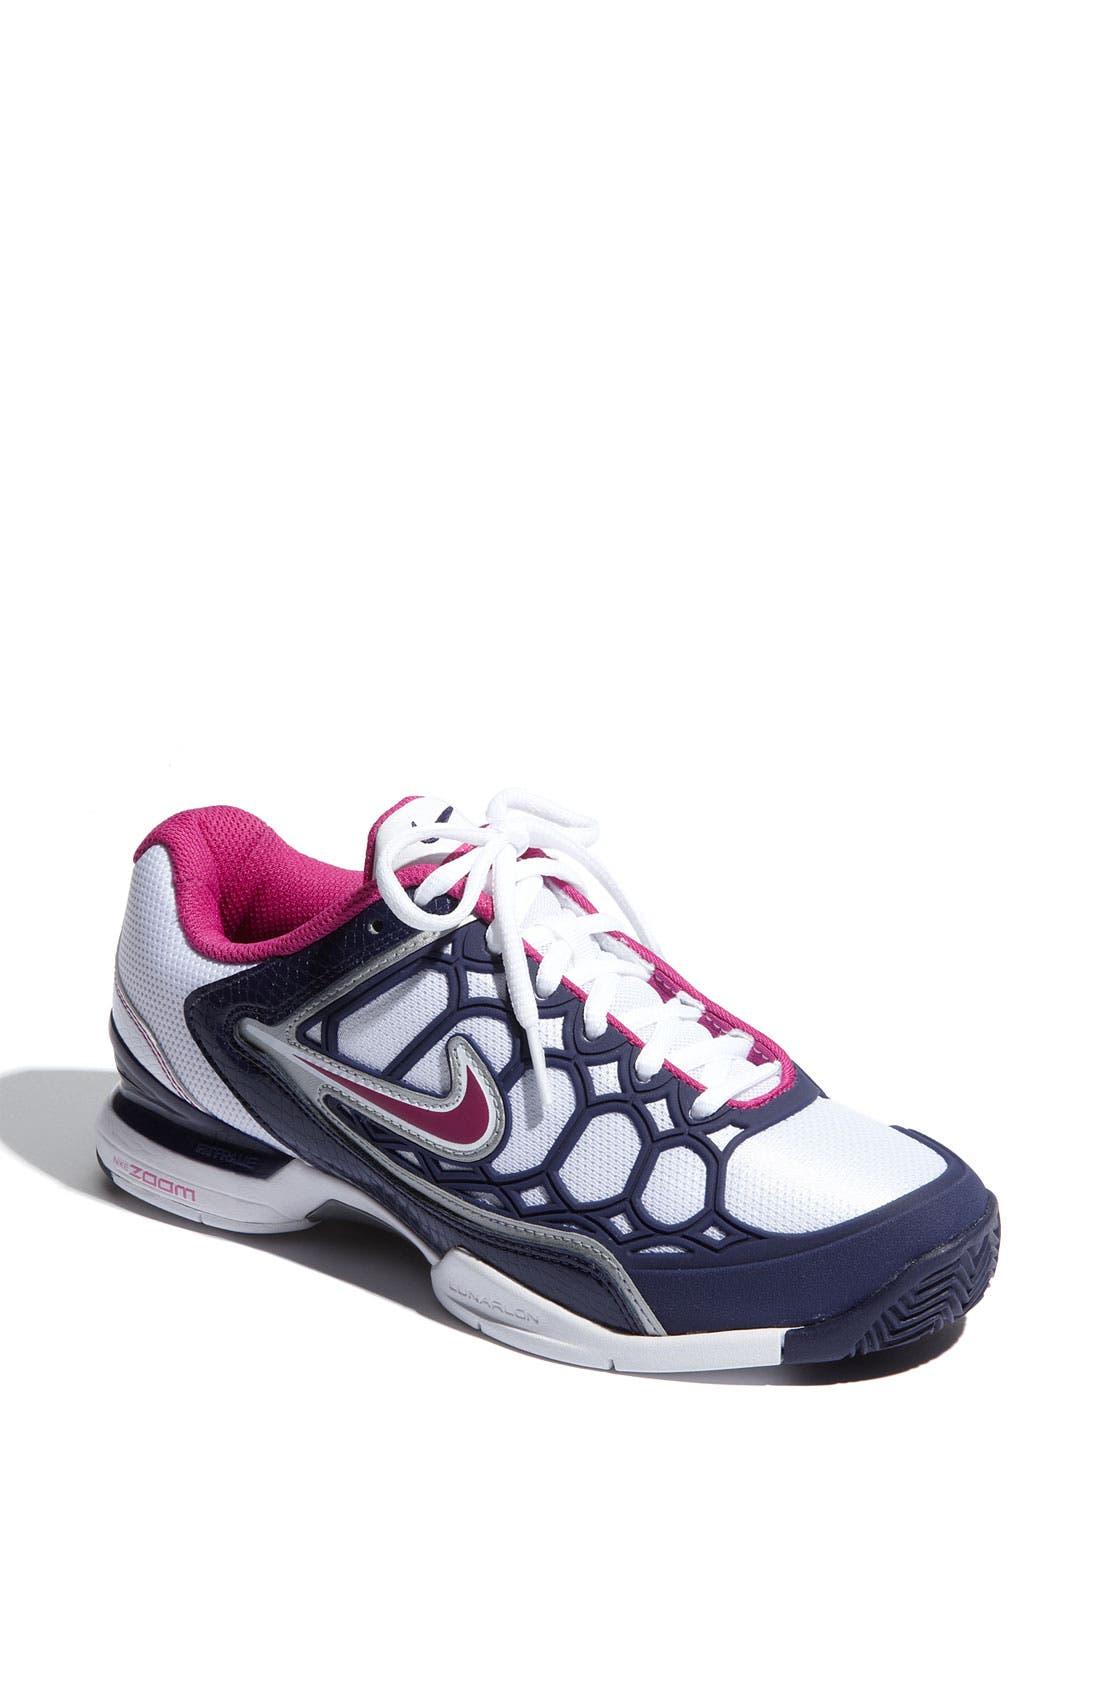 Main Image - Nike 'Zoom Breathe 2' Tennis Shoe (Women)